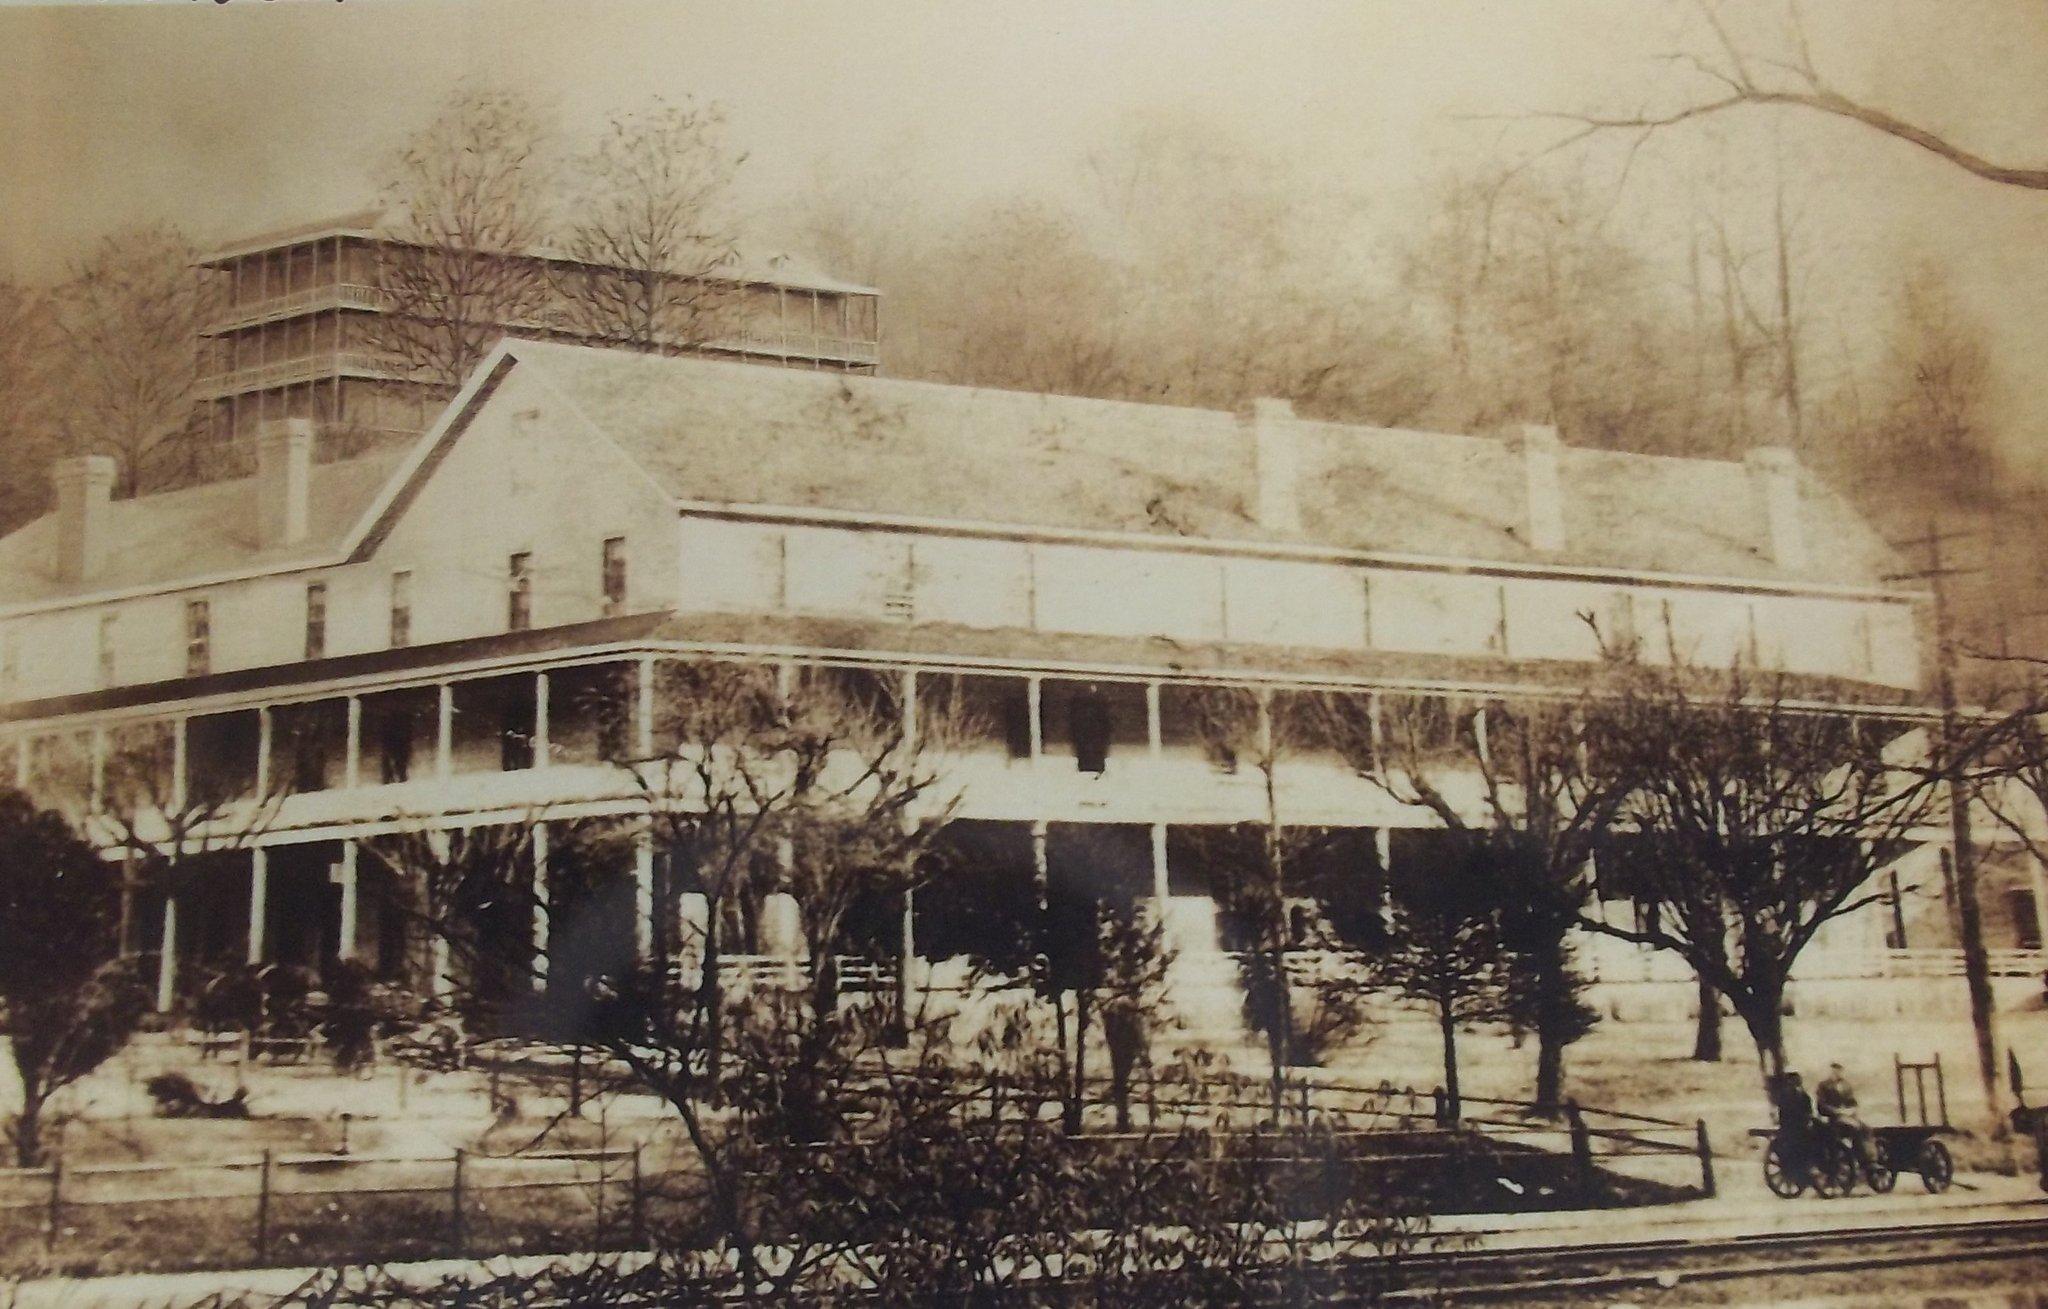 Patron - Blount County, Alabama - local news March, 1879